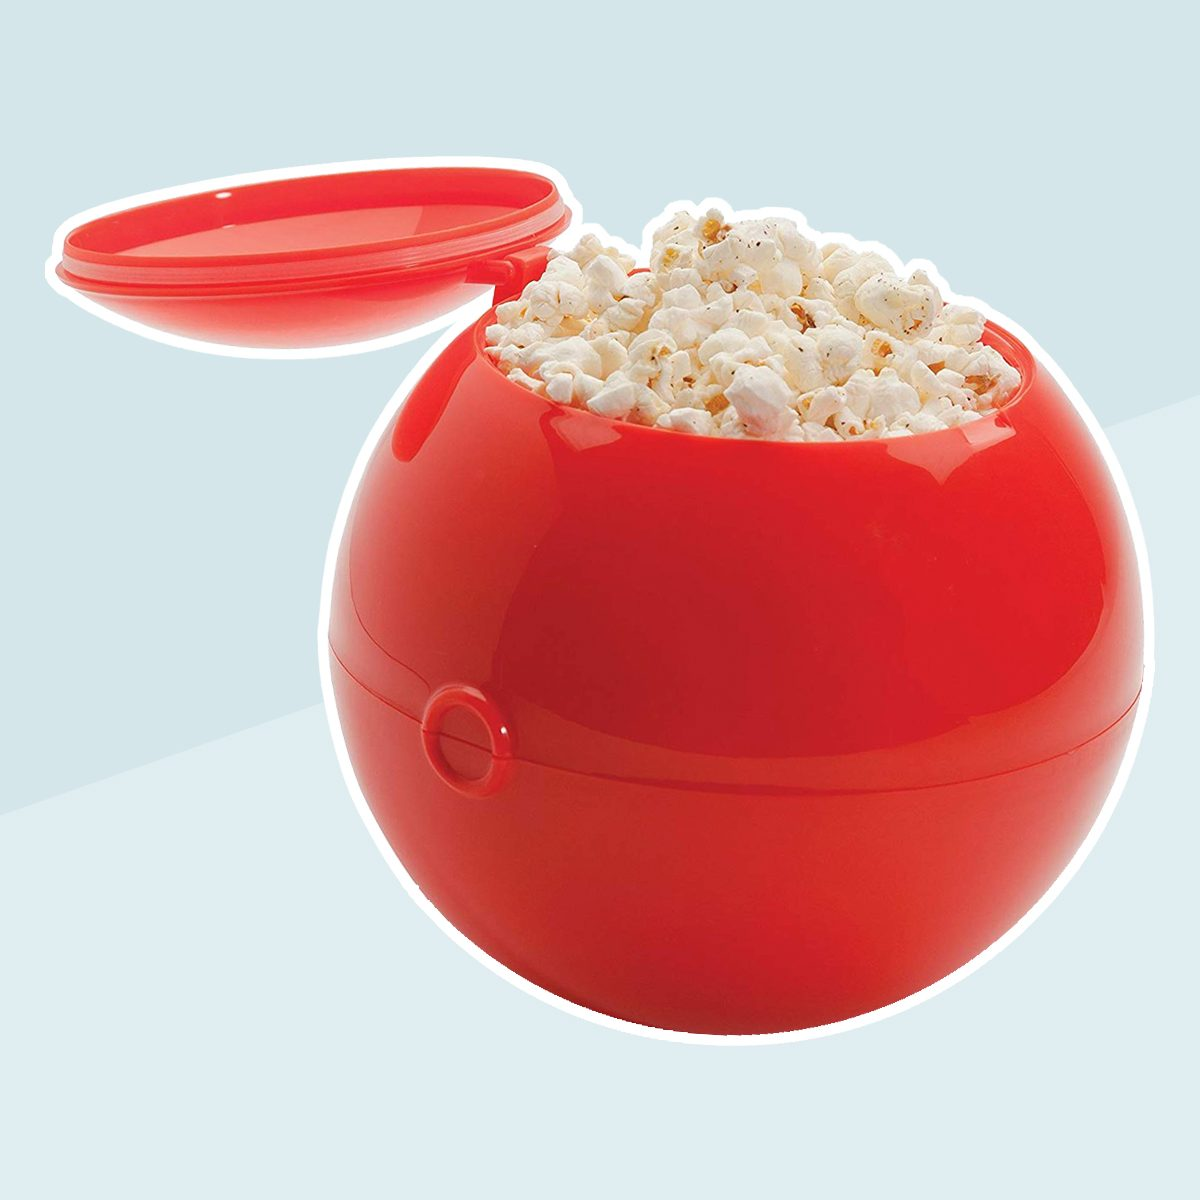 FuhlSpeed KPB-27 Popcorn Ball Microwavable Popcorn Maker/Mixer